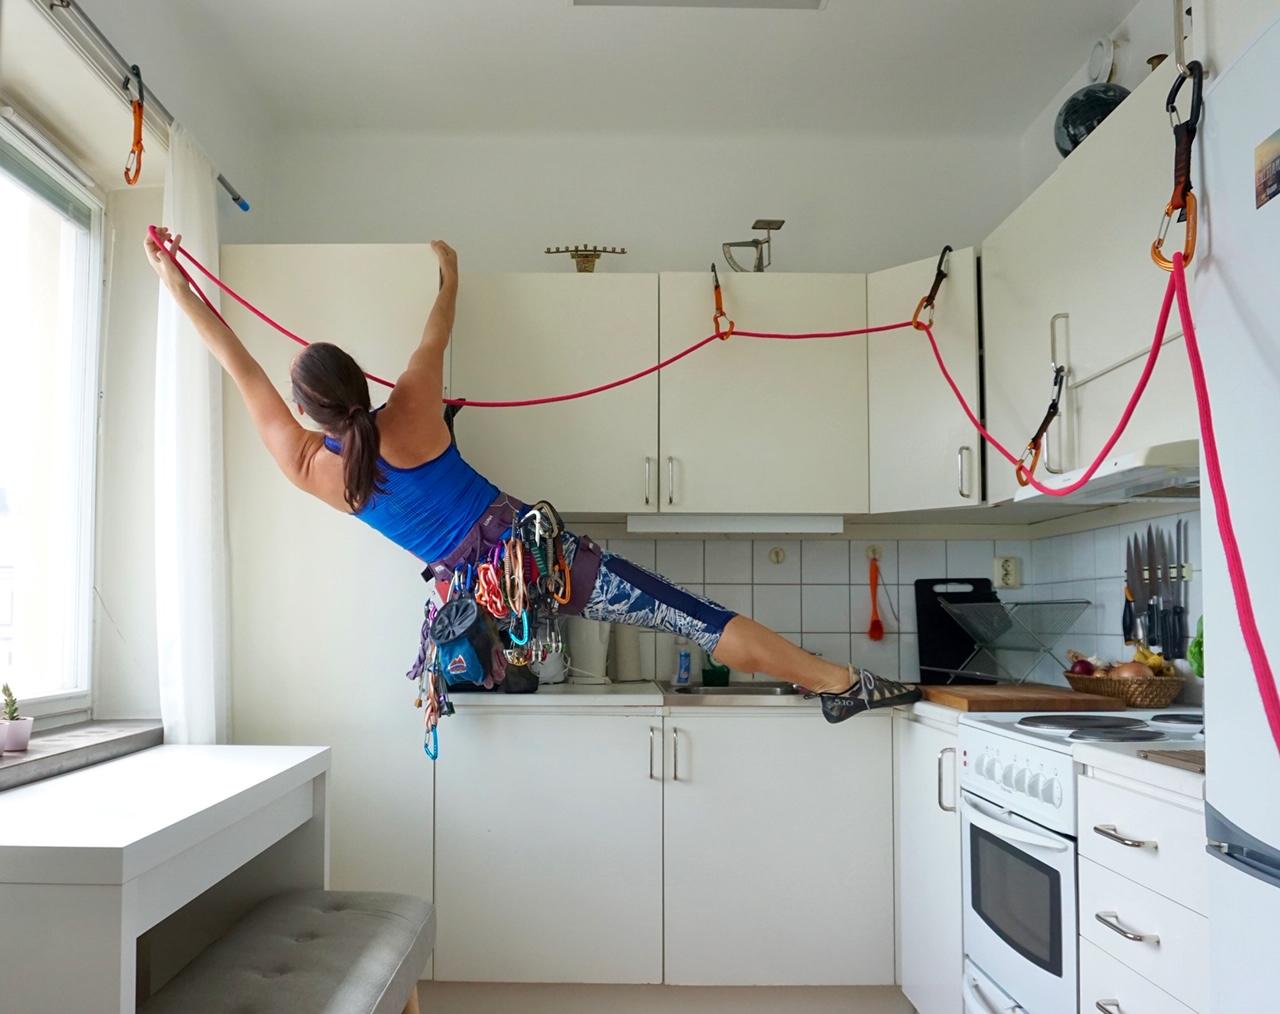 UW alumna Nicole Savage rock climbs her kitchen cabinets.